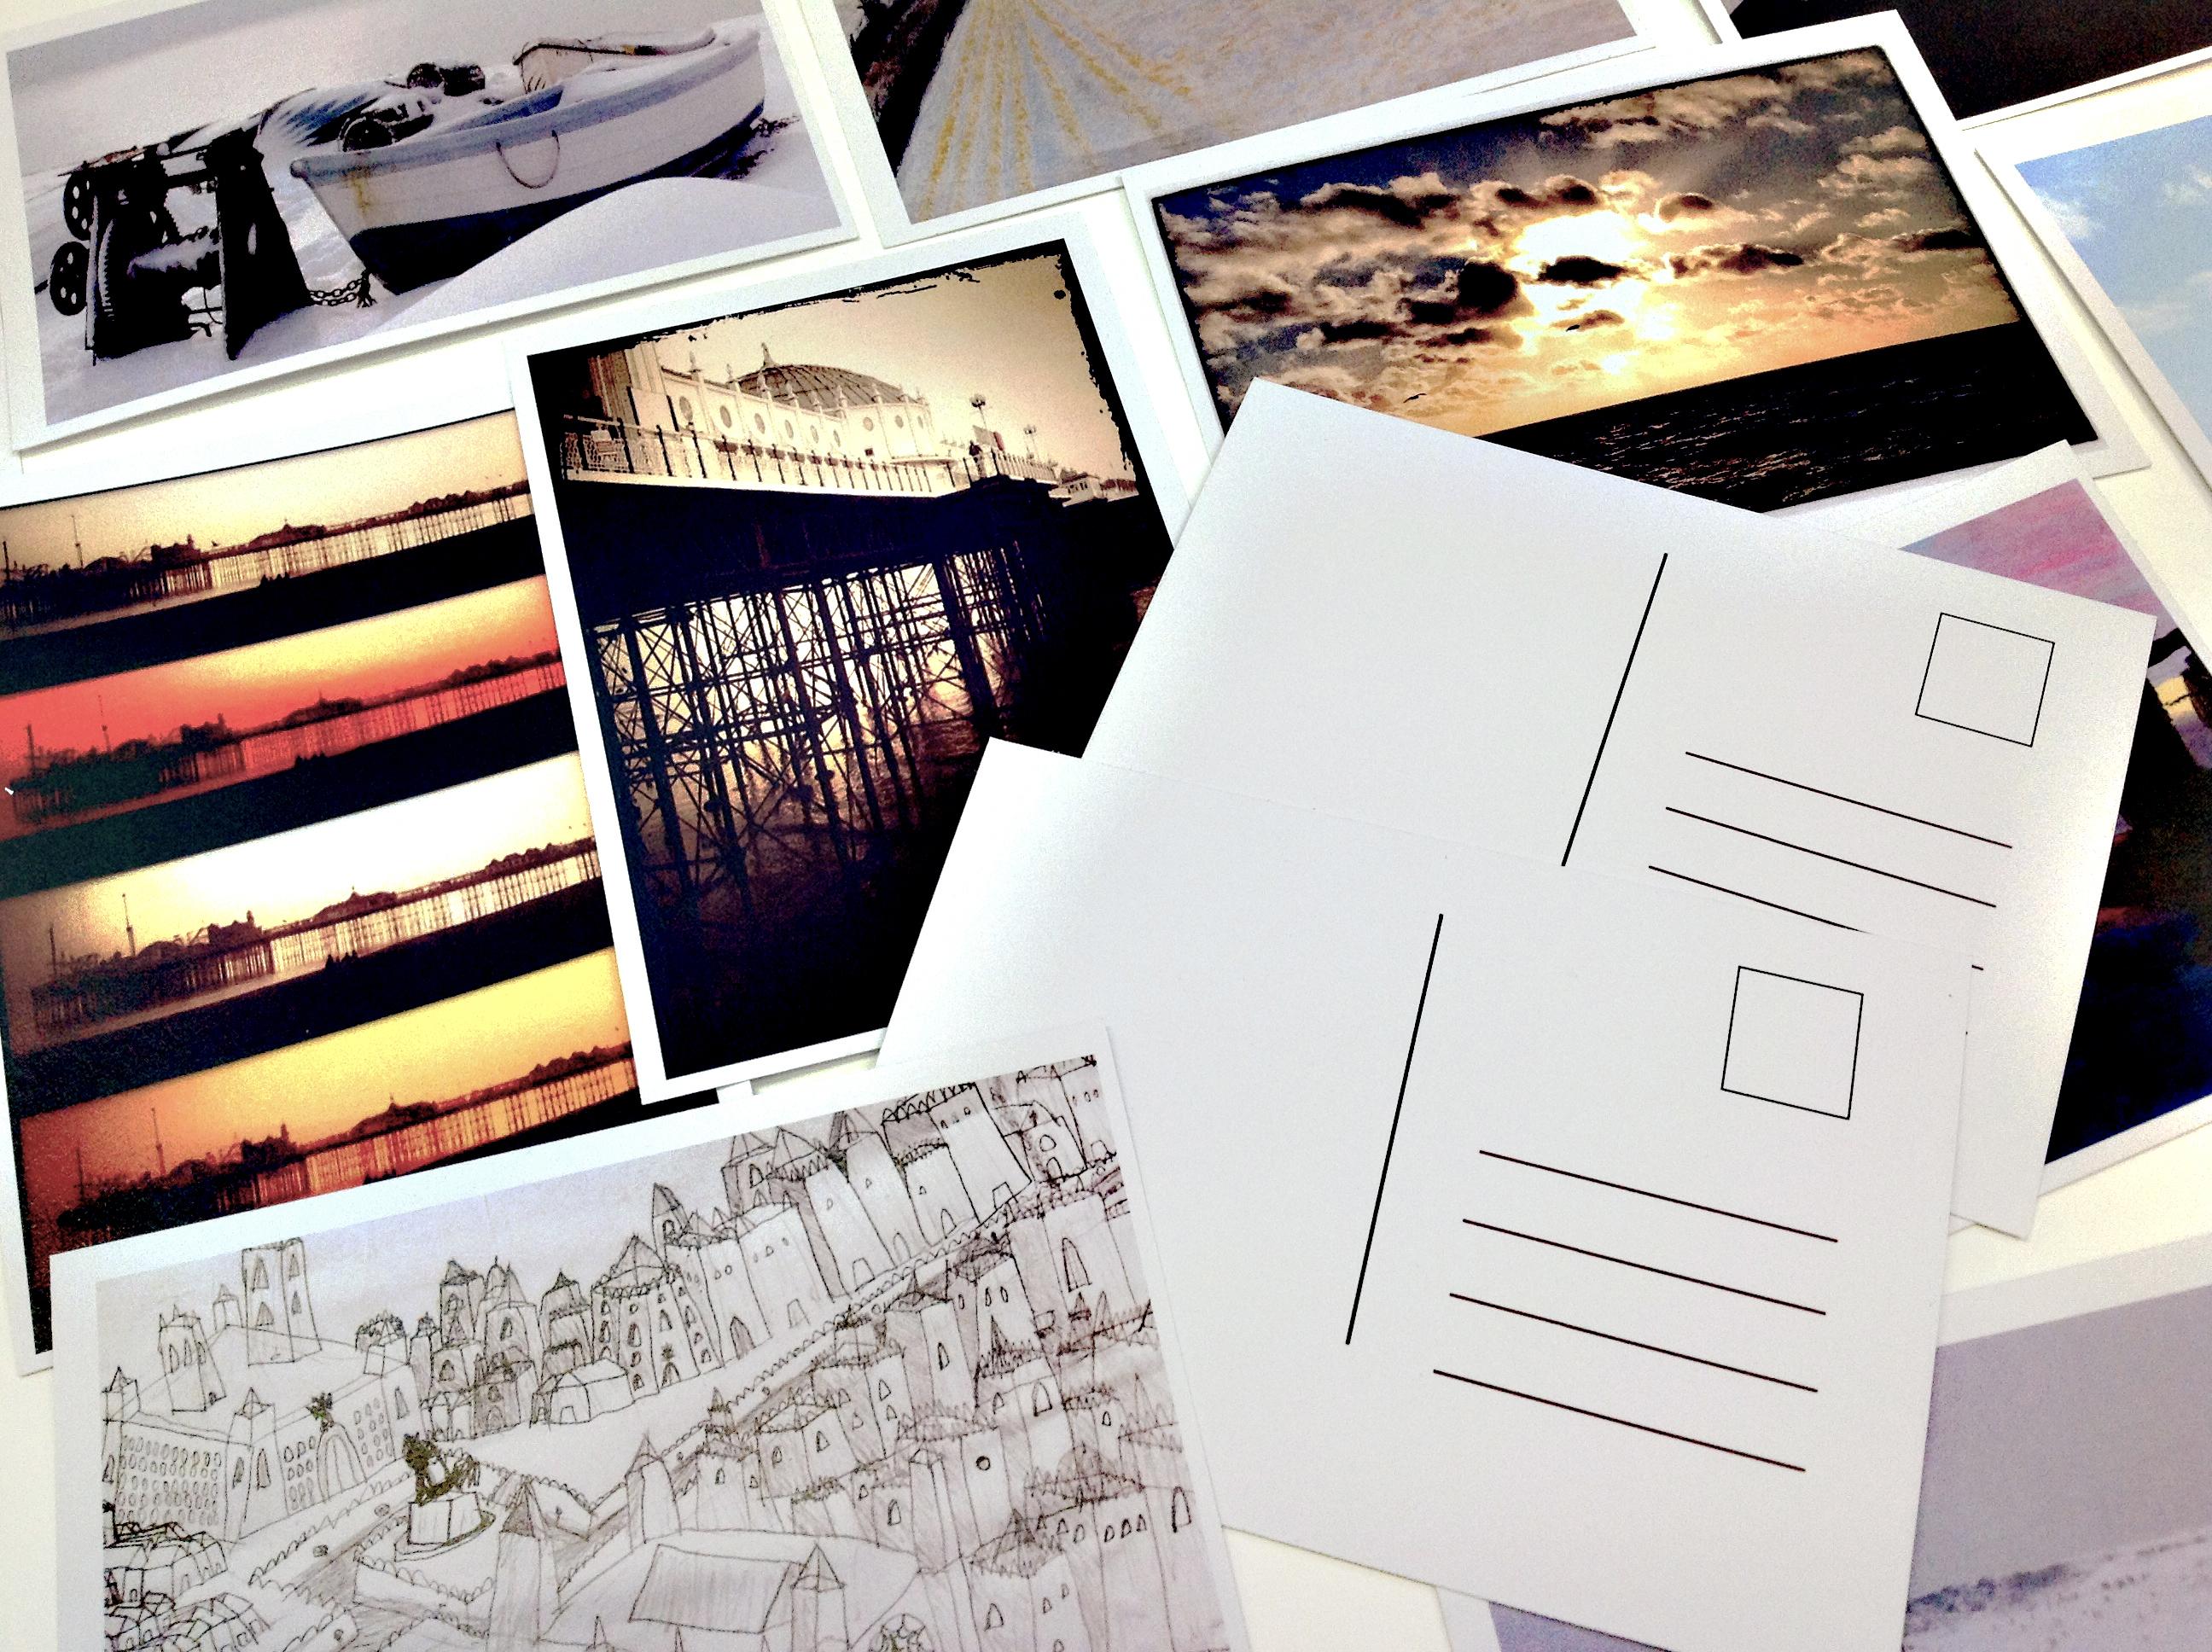 Or postcards for when thereisn'tWi-Fi!